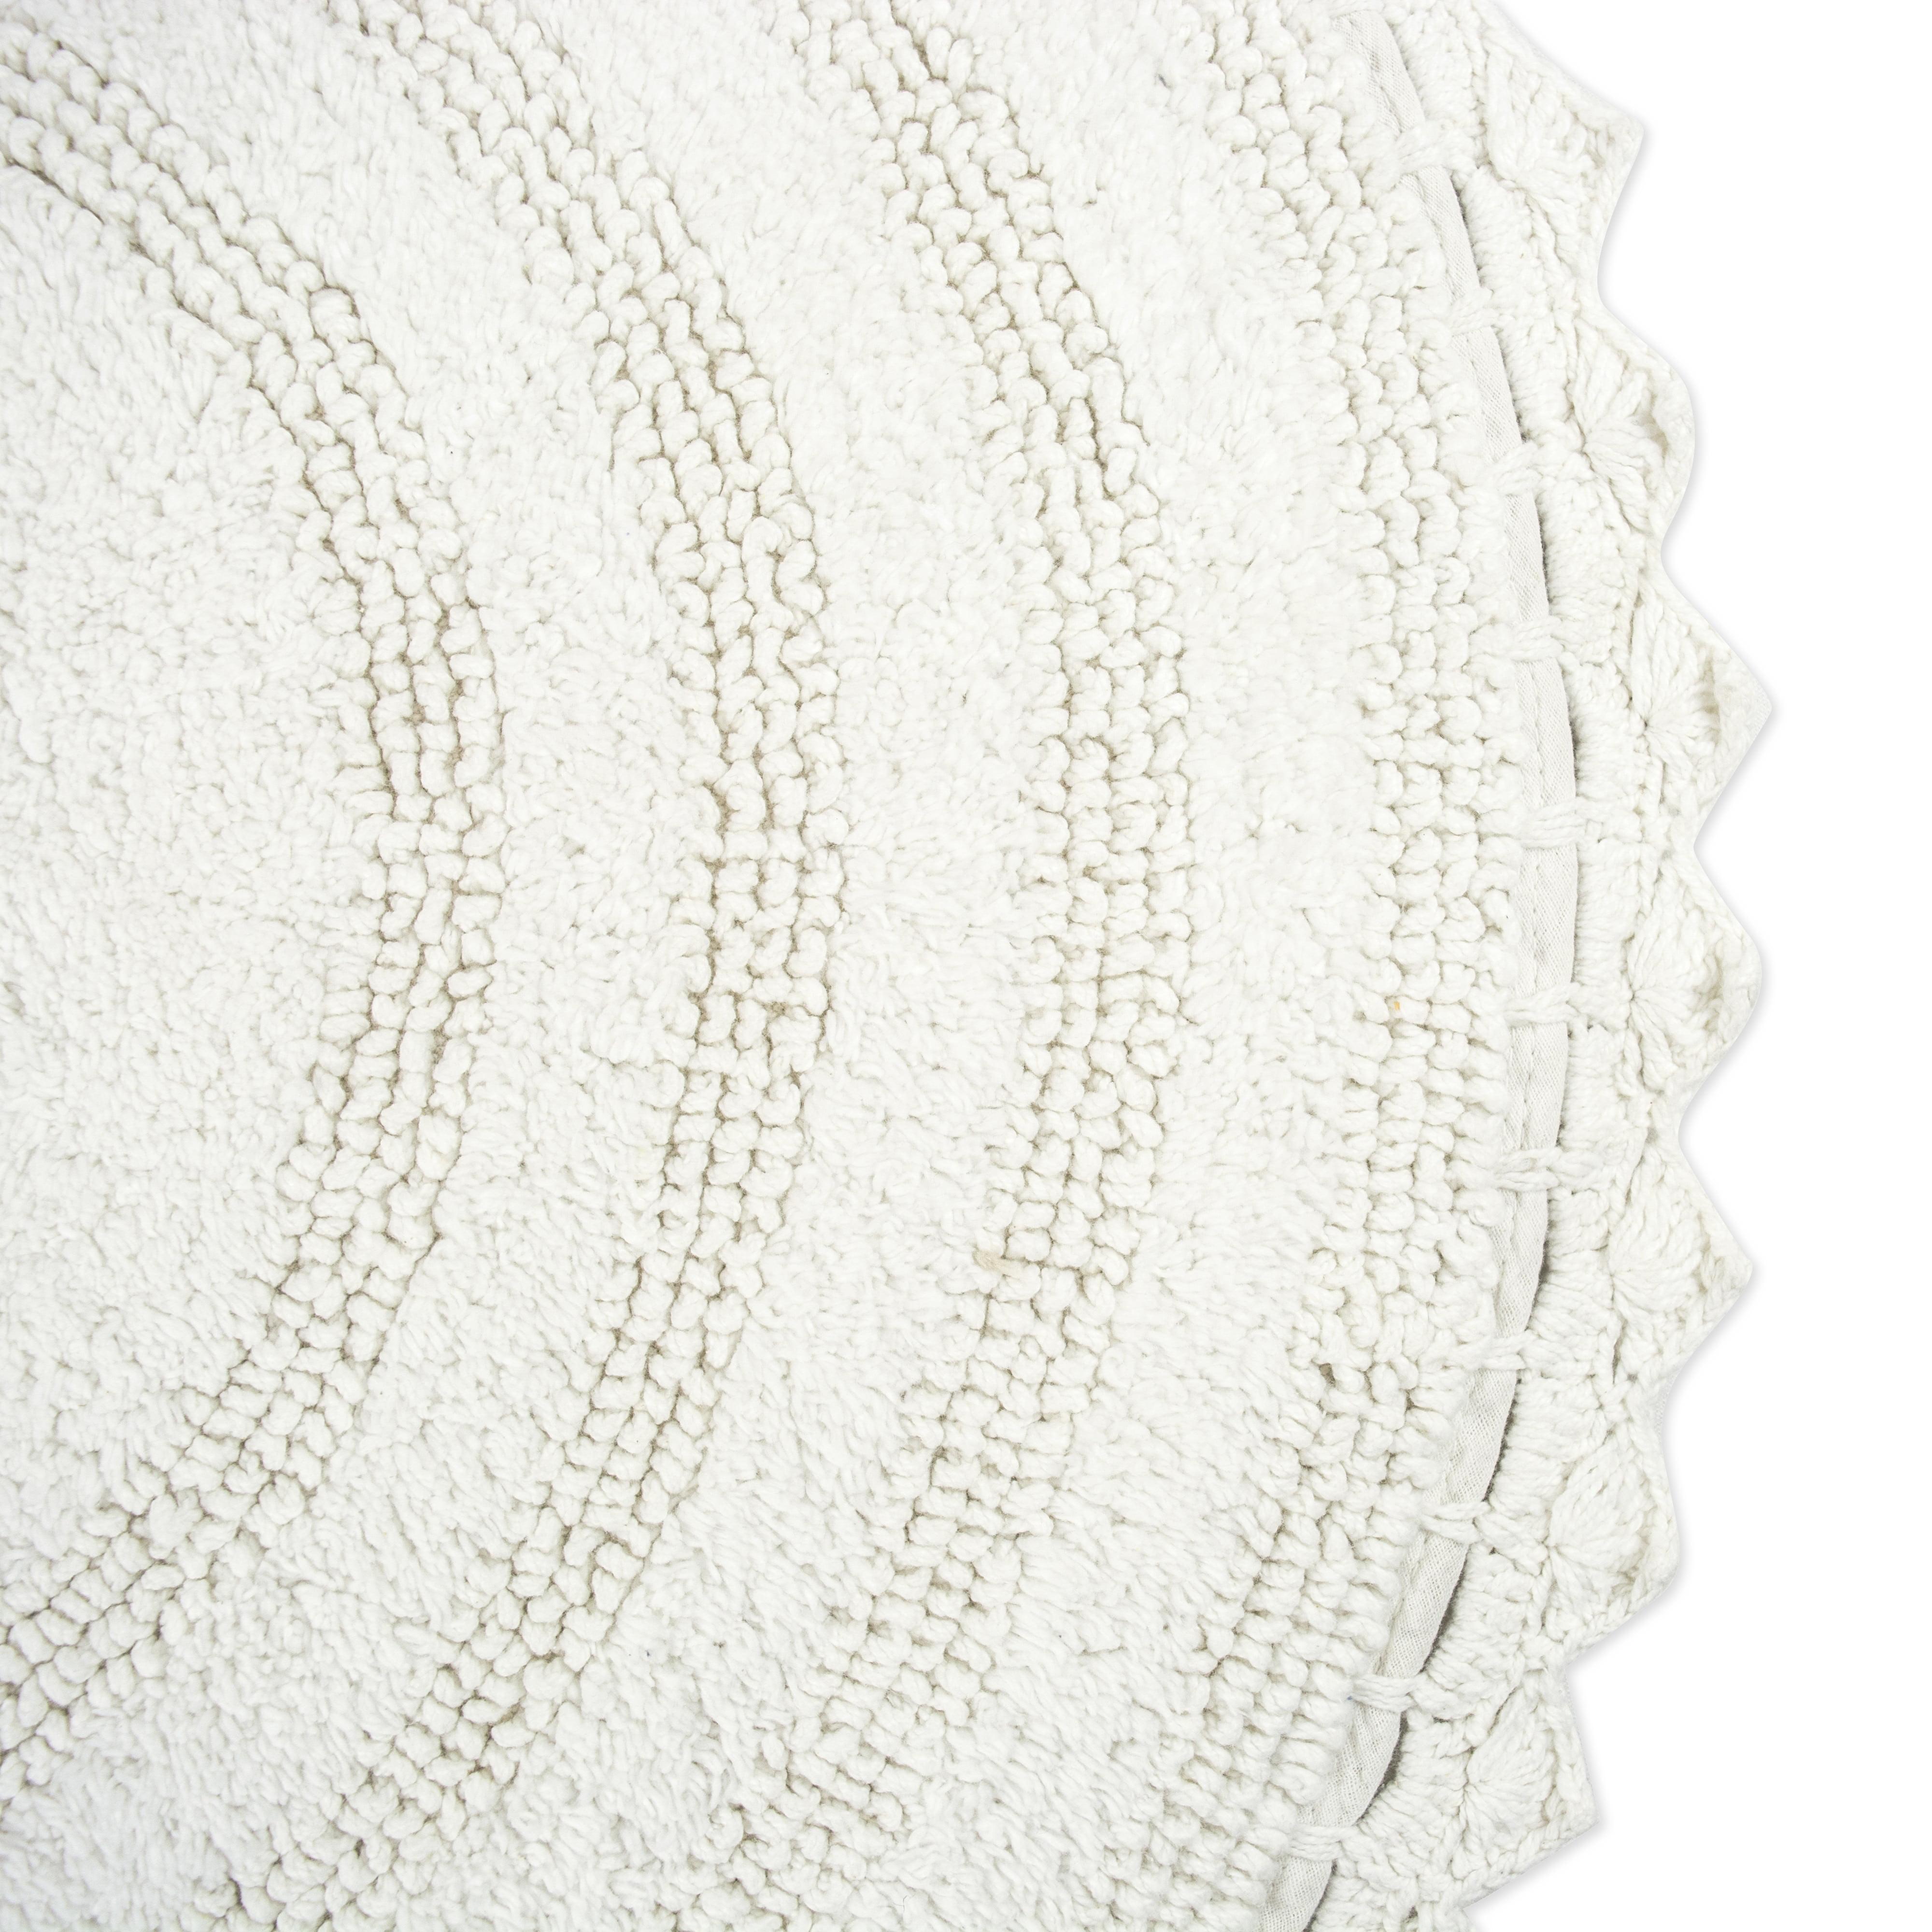 Design Imports Round Crochet Bath Mat 28 X28 100 Cotton Multiple Colors Walmart Com Walmart Com